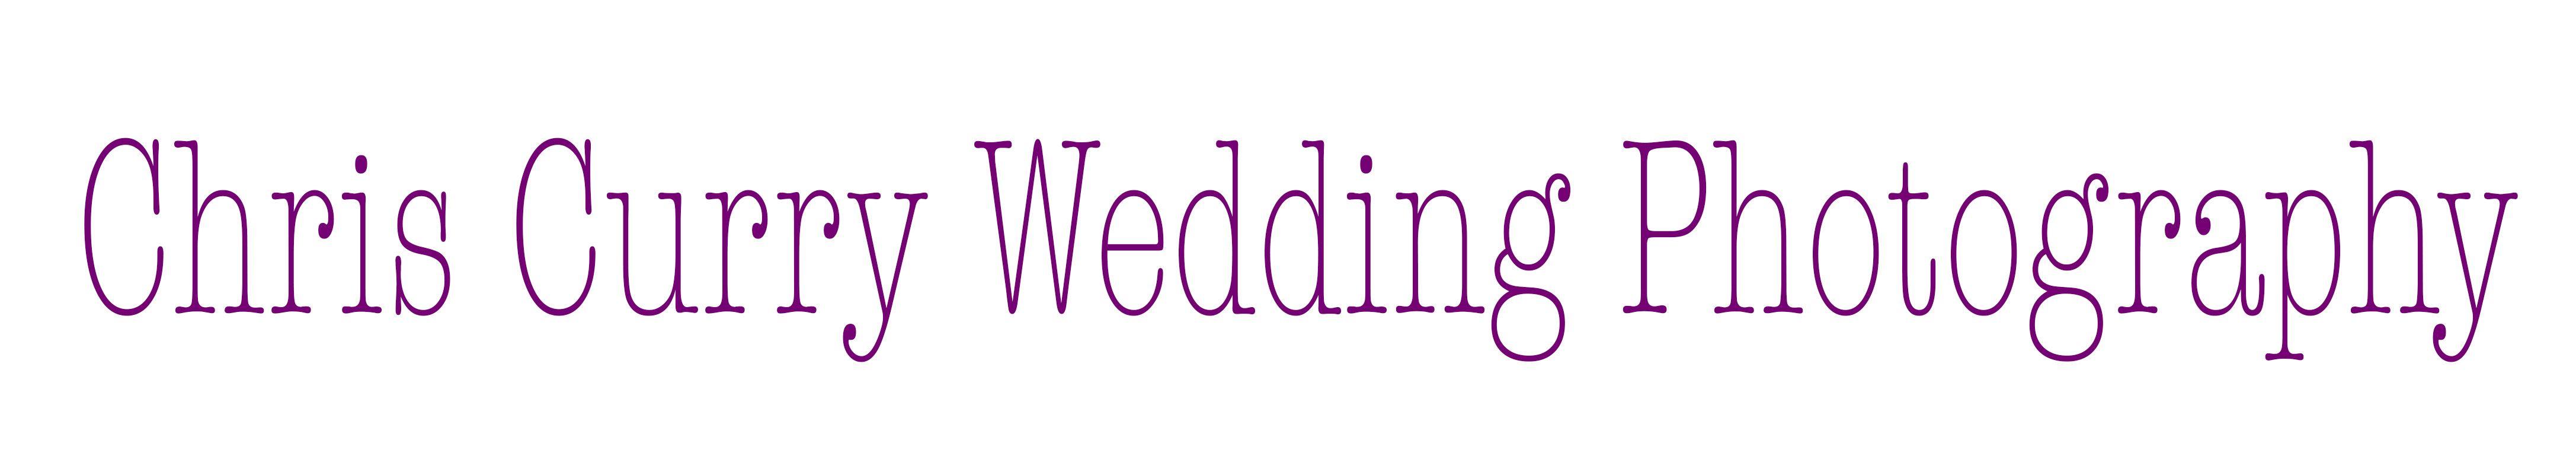 Chris Curry Wedding Photography